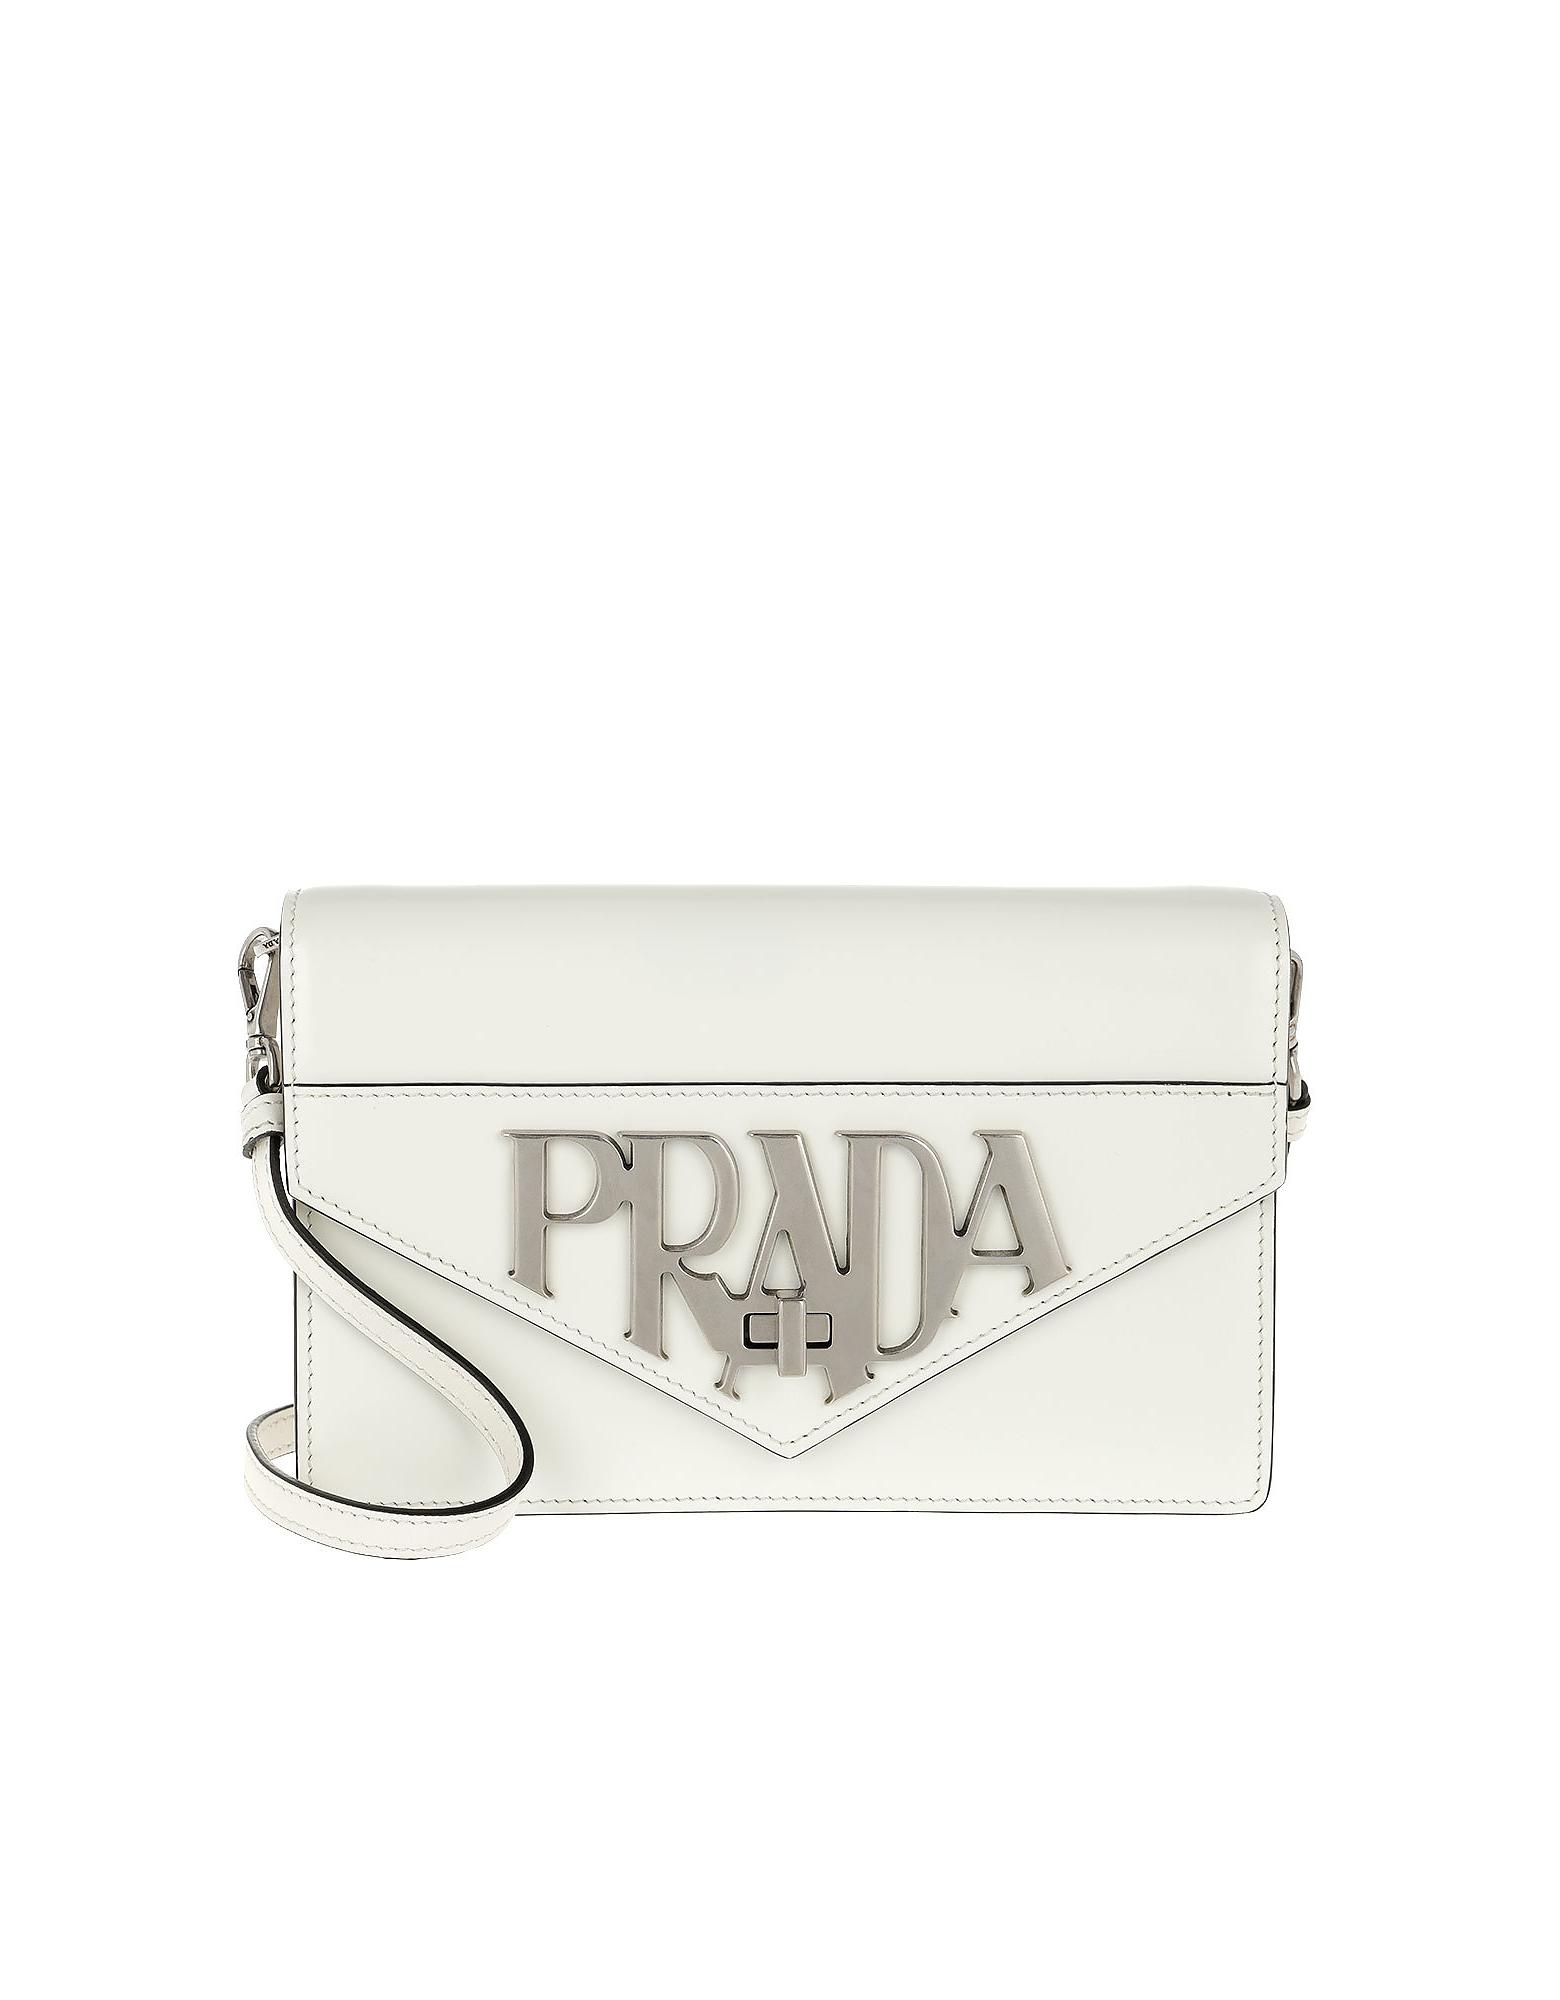 197c5f14dc17 PRADA LOGO PATTERN ANTIQUE SHOULDER BAG WHITE. Photo: FORZIERI